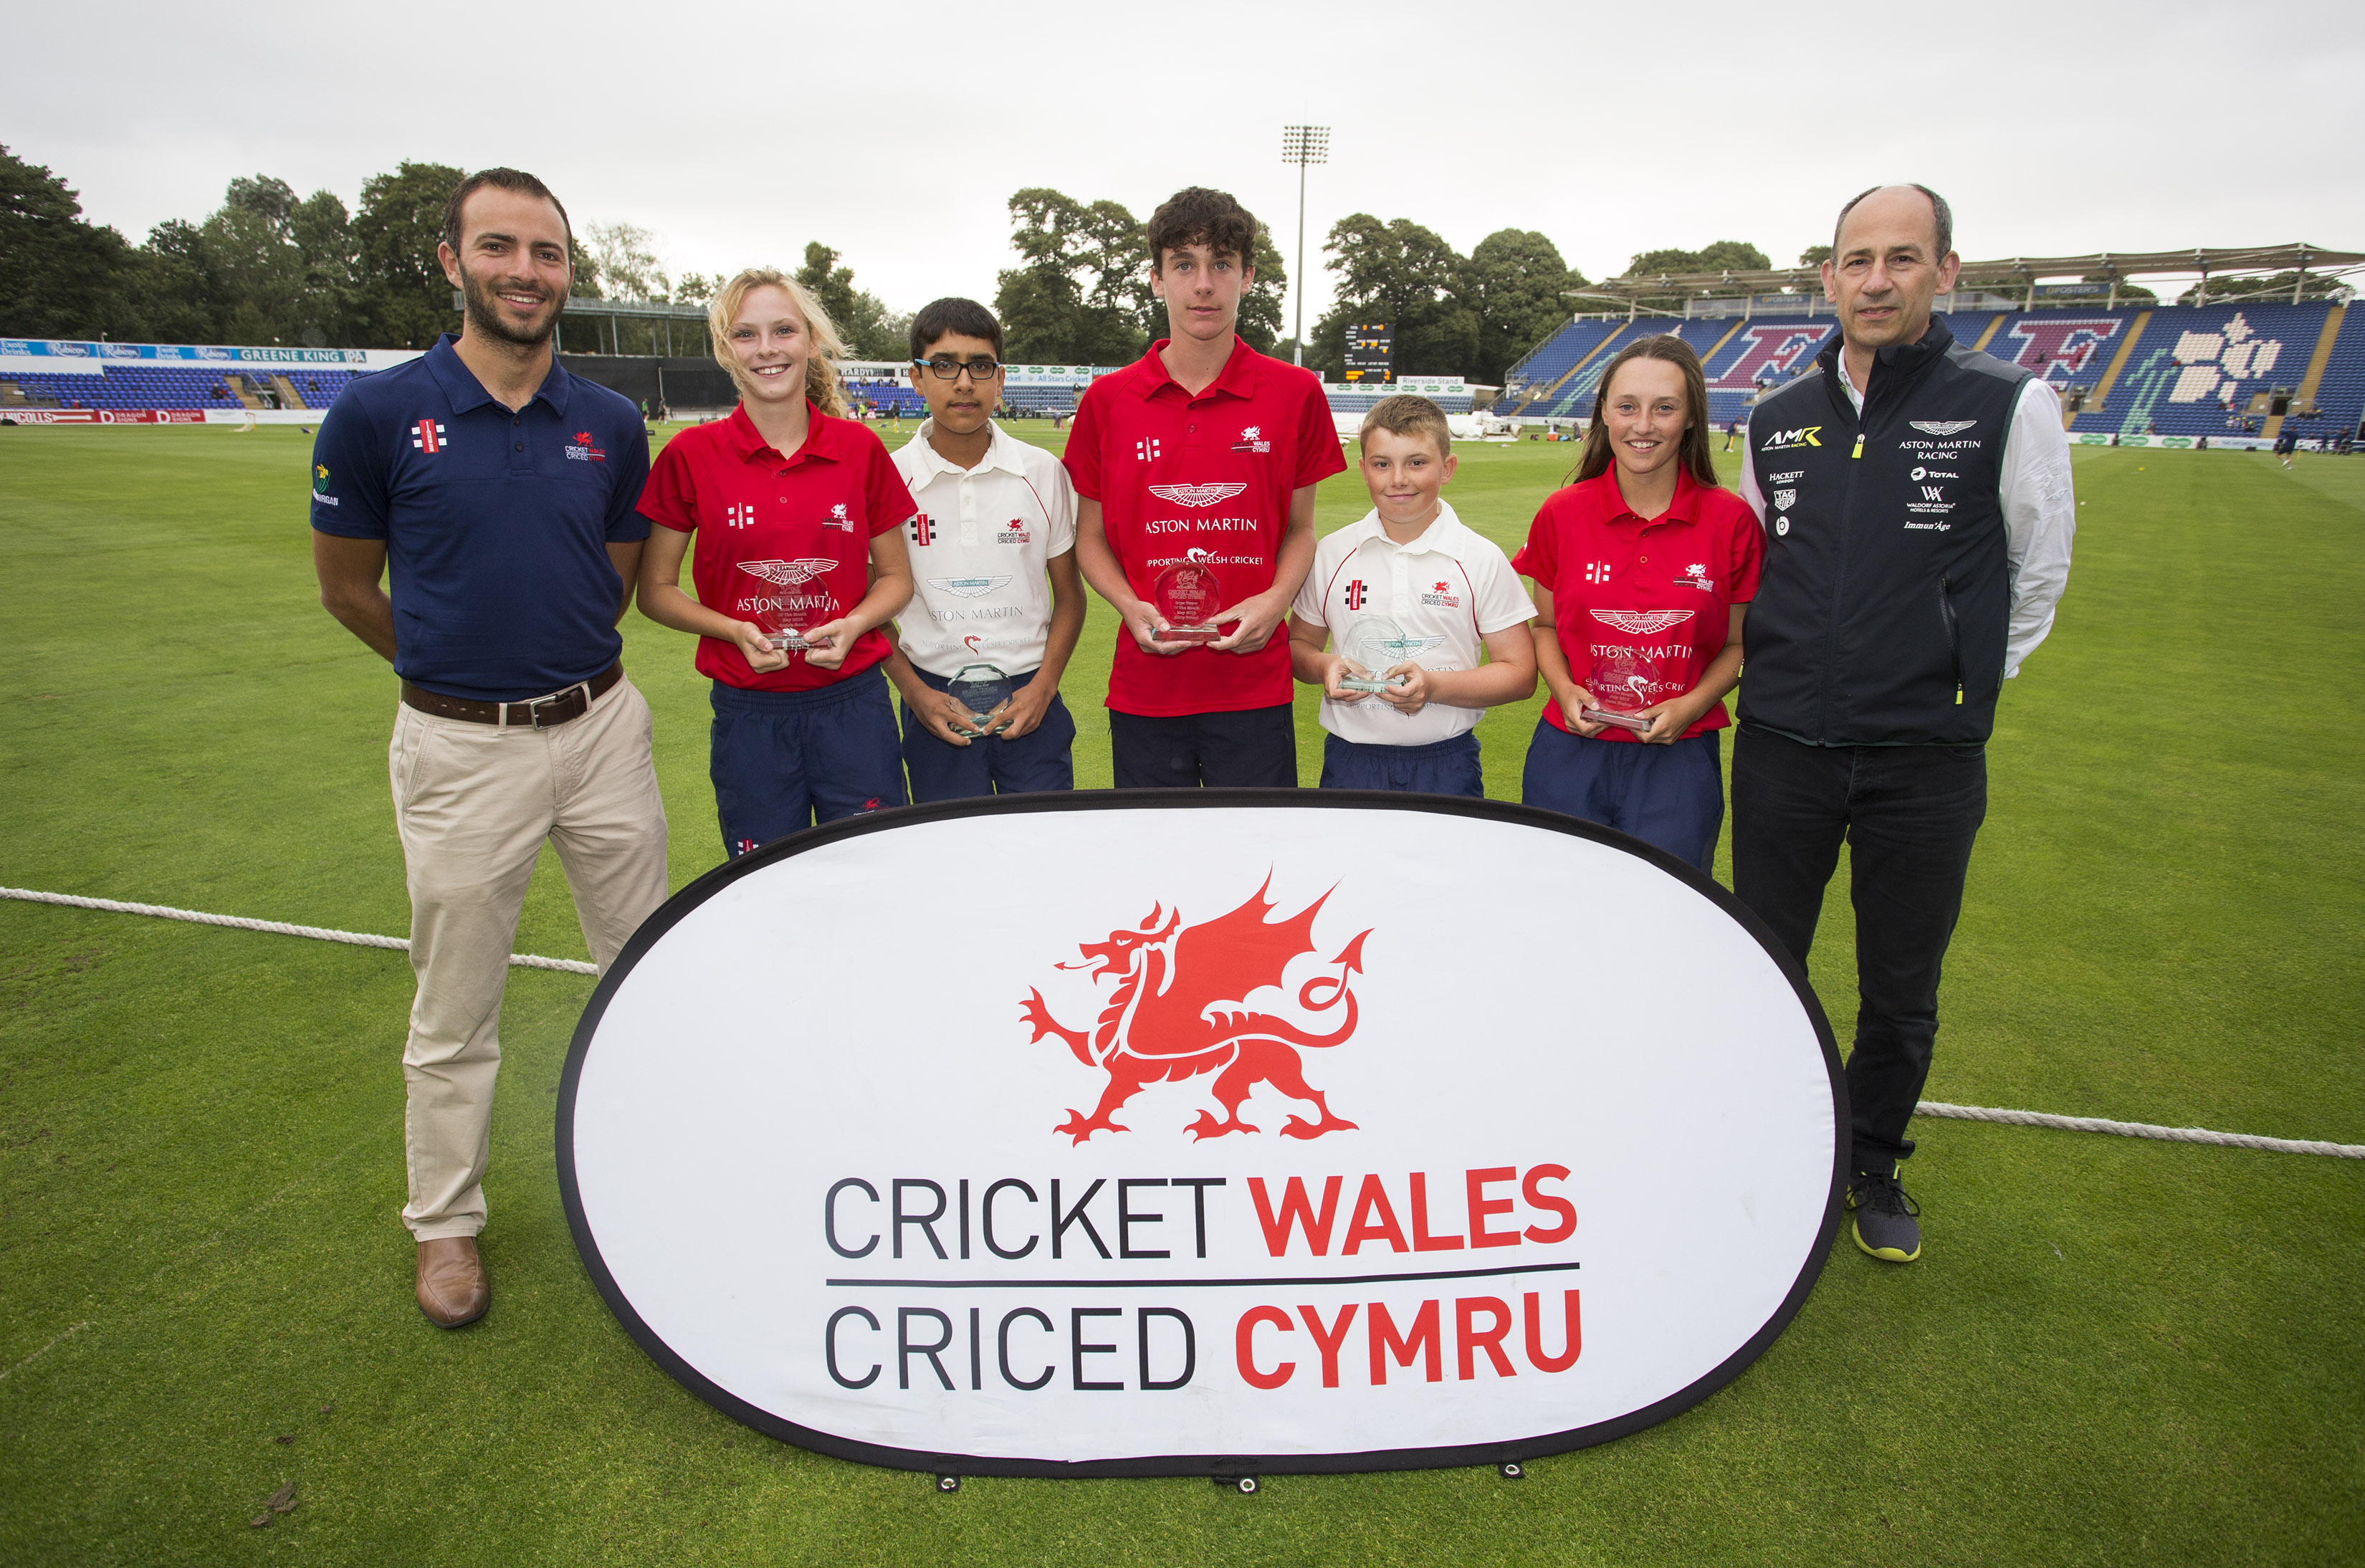 Cricket Wales - News